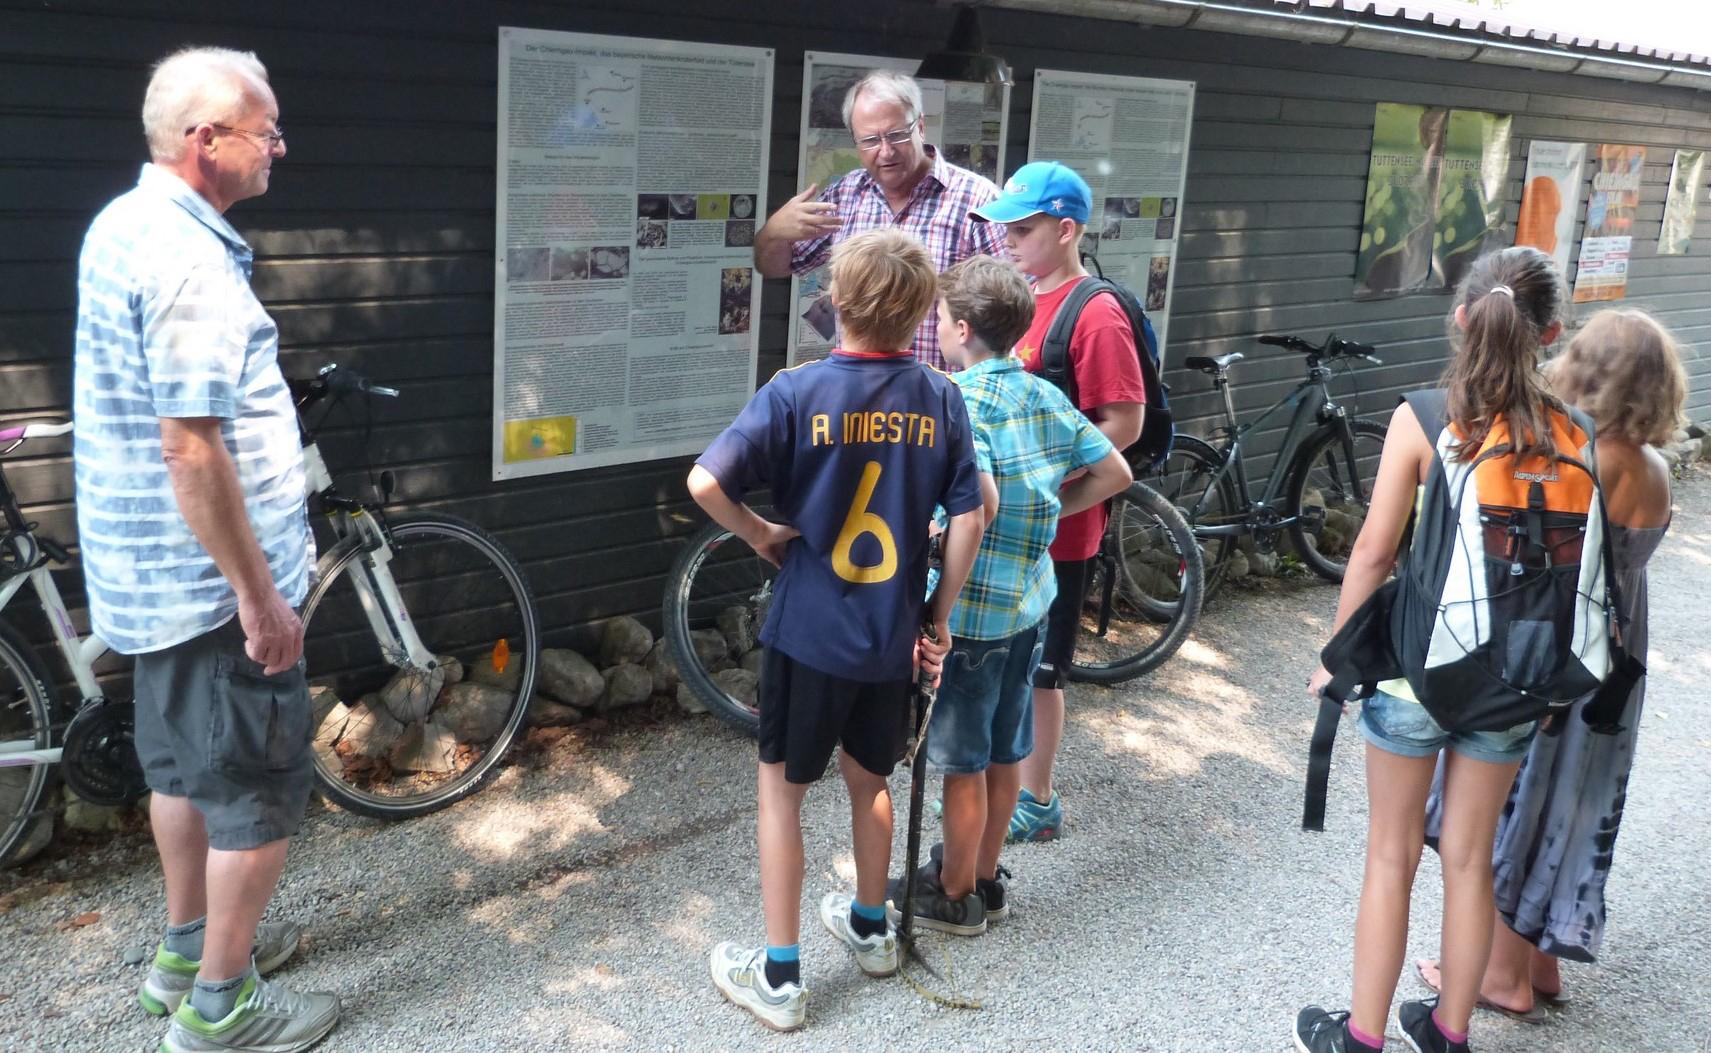 Kinderferienprogramm Chiemgau-Impakt Tüttensee-Meteoritenkrater